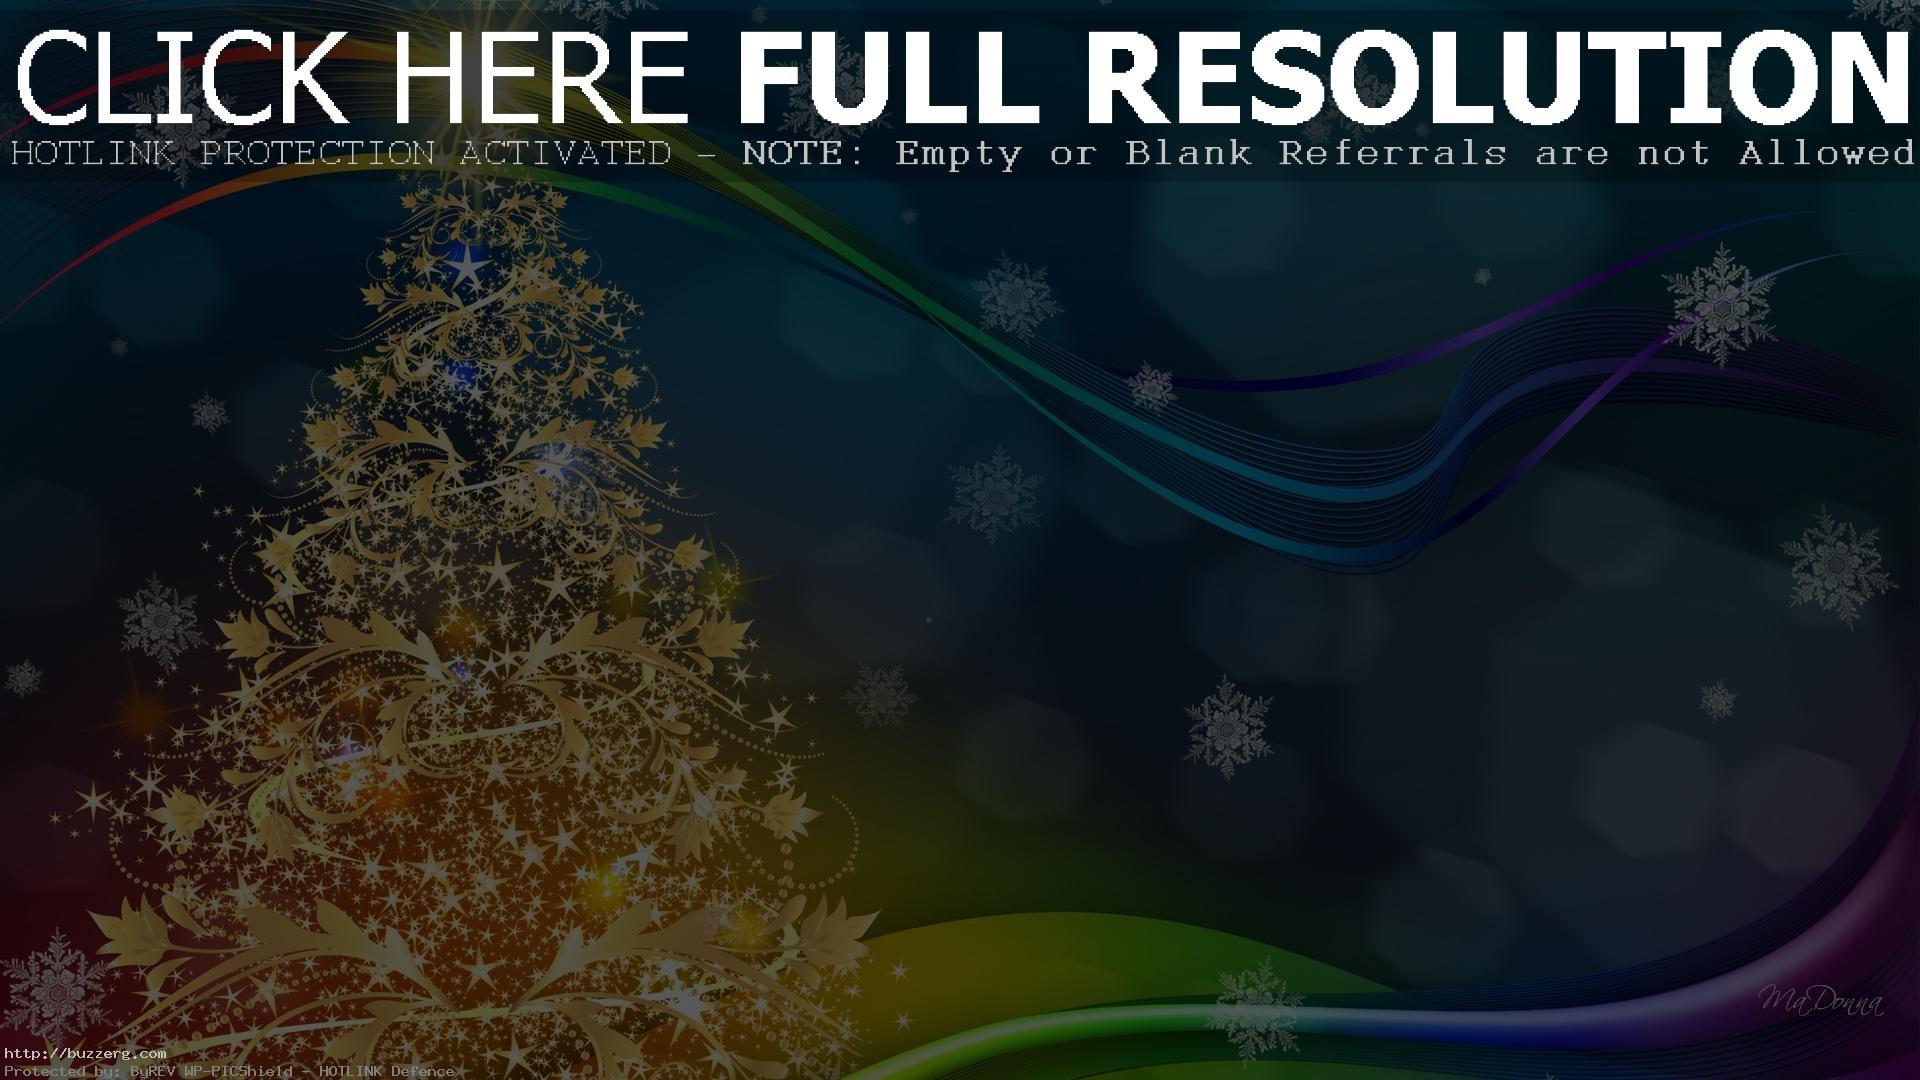 Merry Christmas Tree (id: 135726)